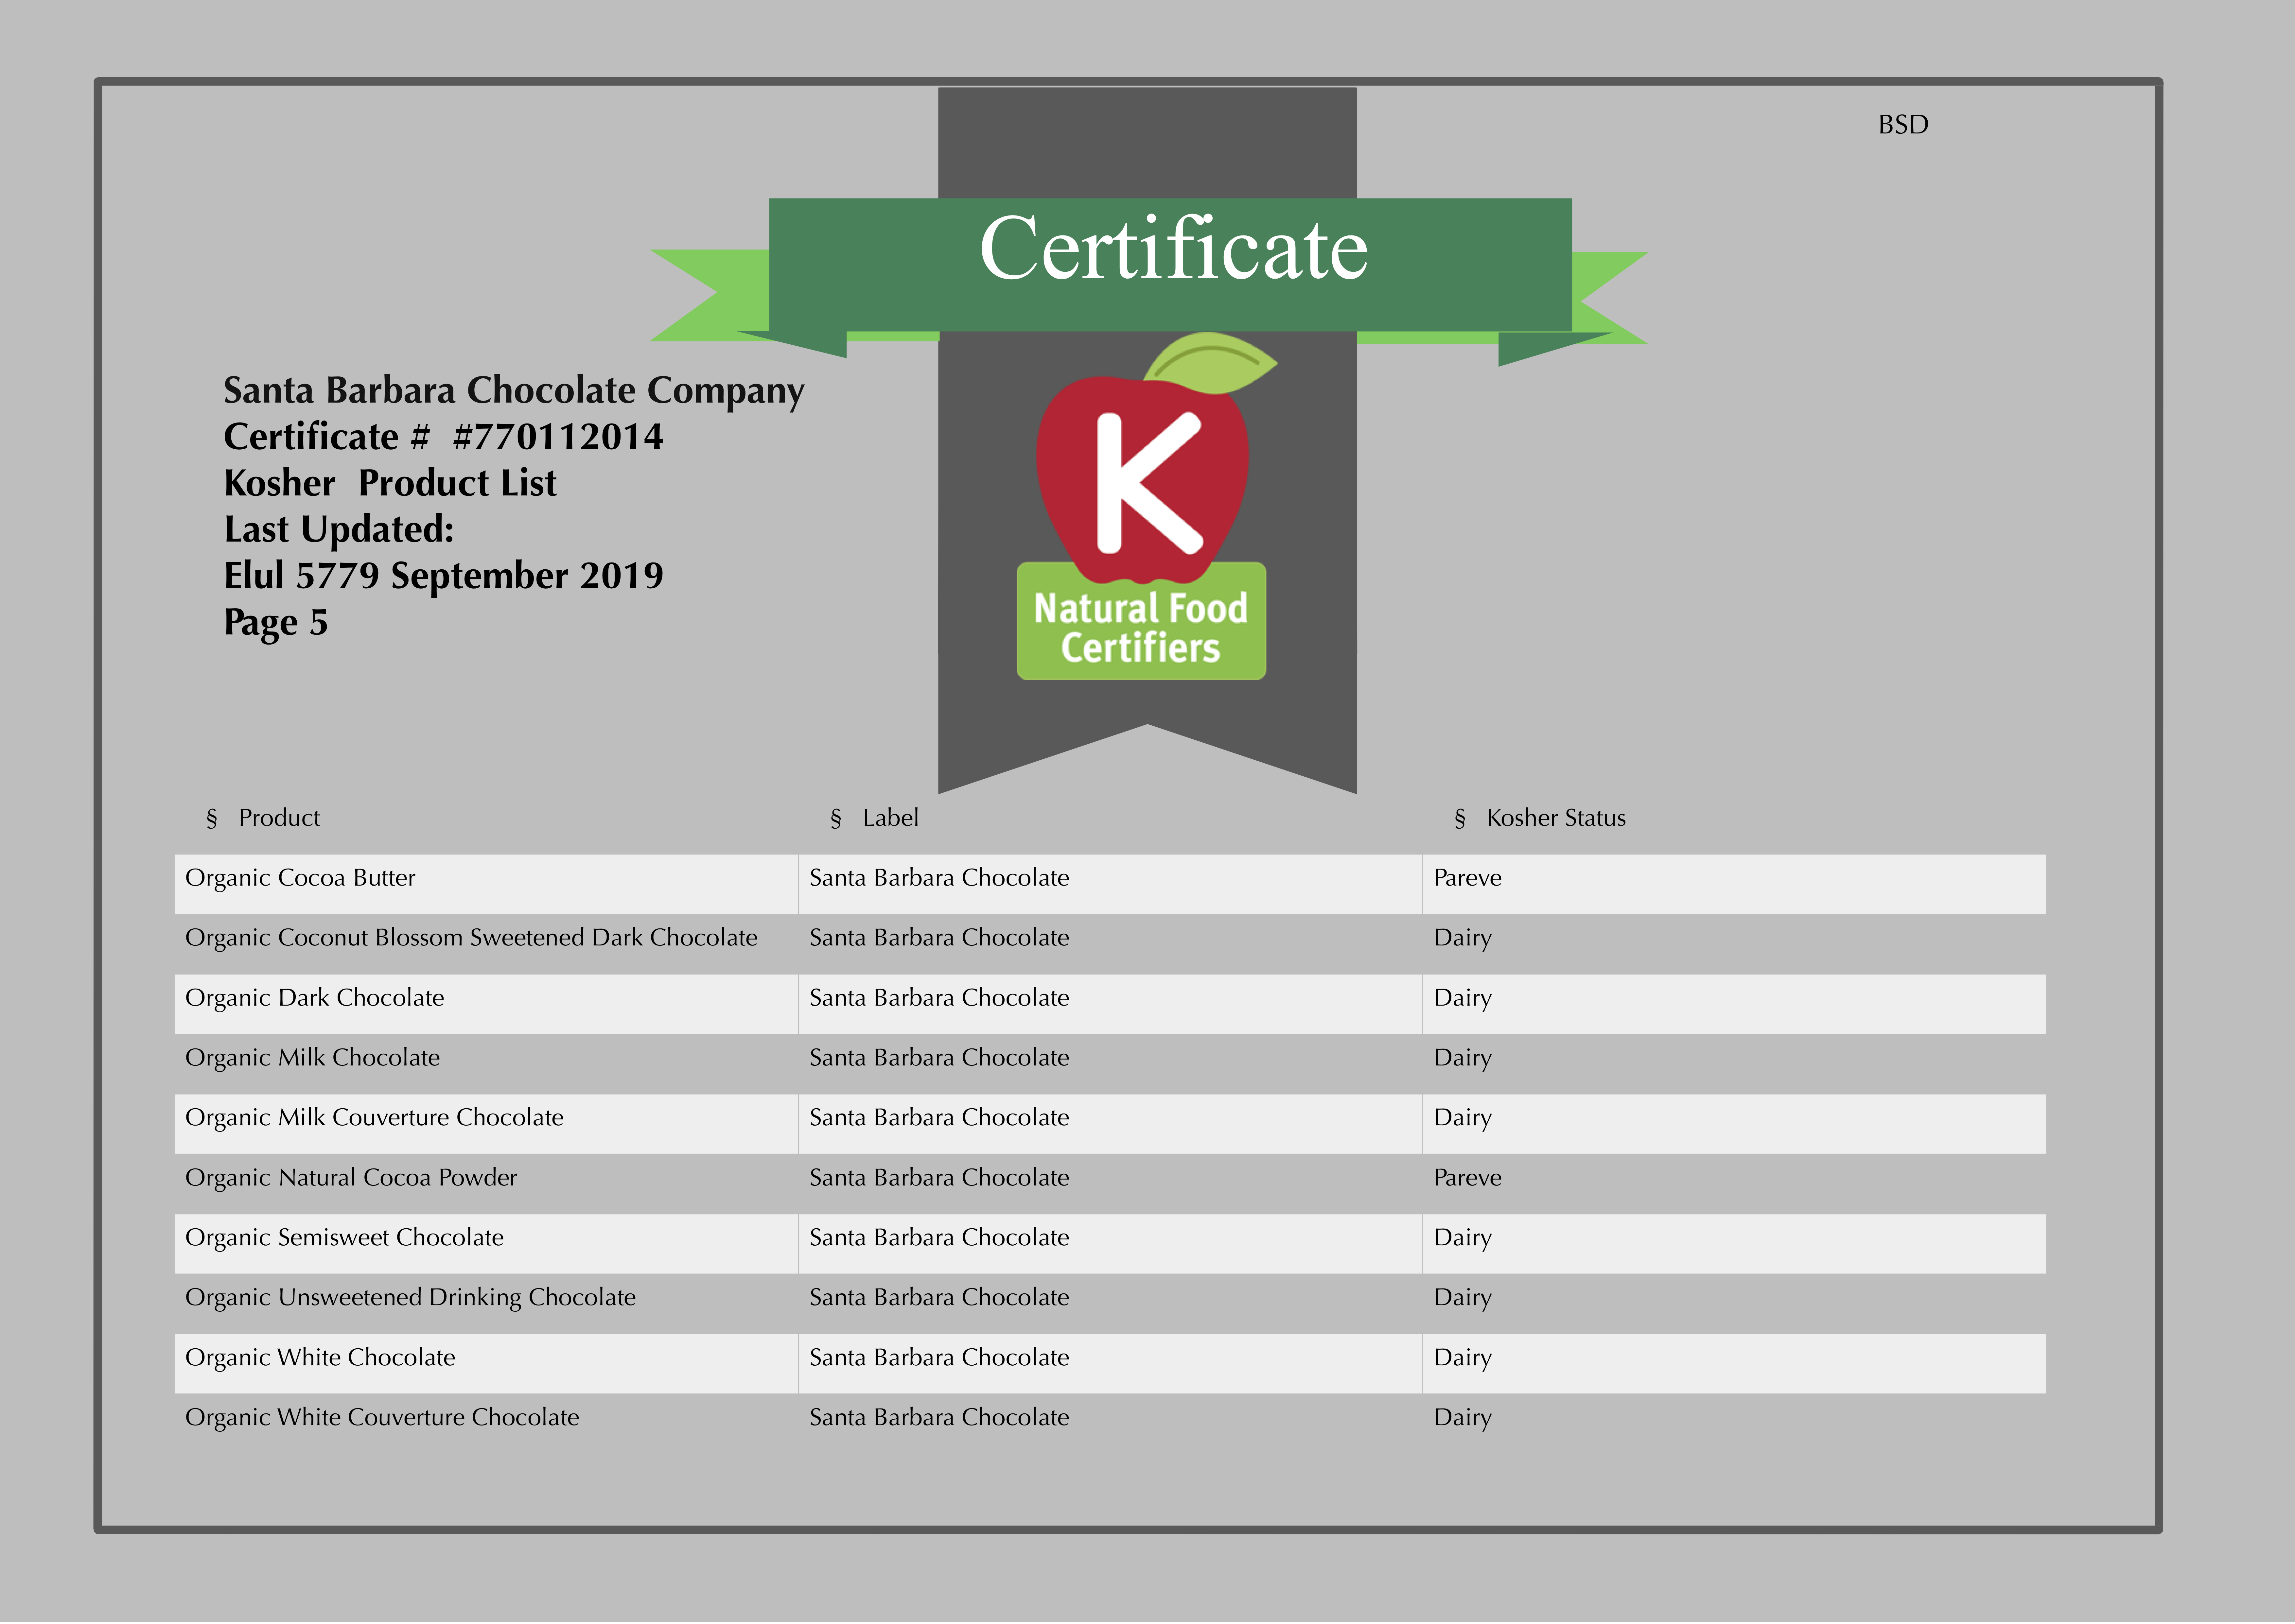 santa-barbara-chocolate-kosher-certificate-2019-2020-page-6.jpg